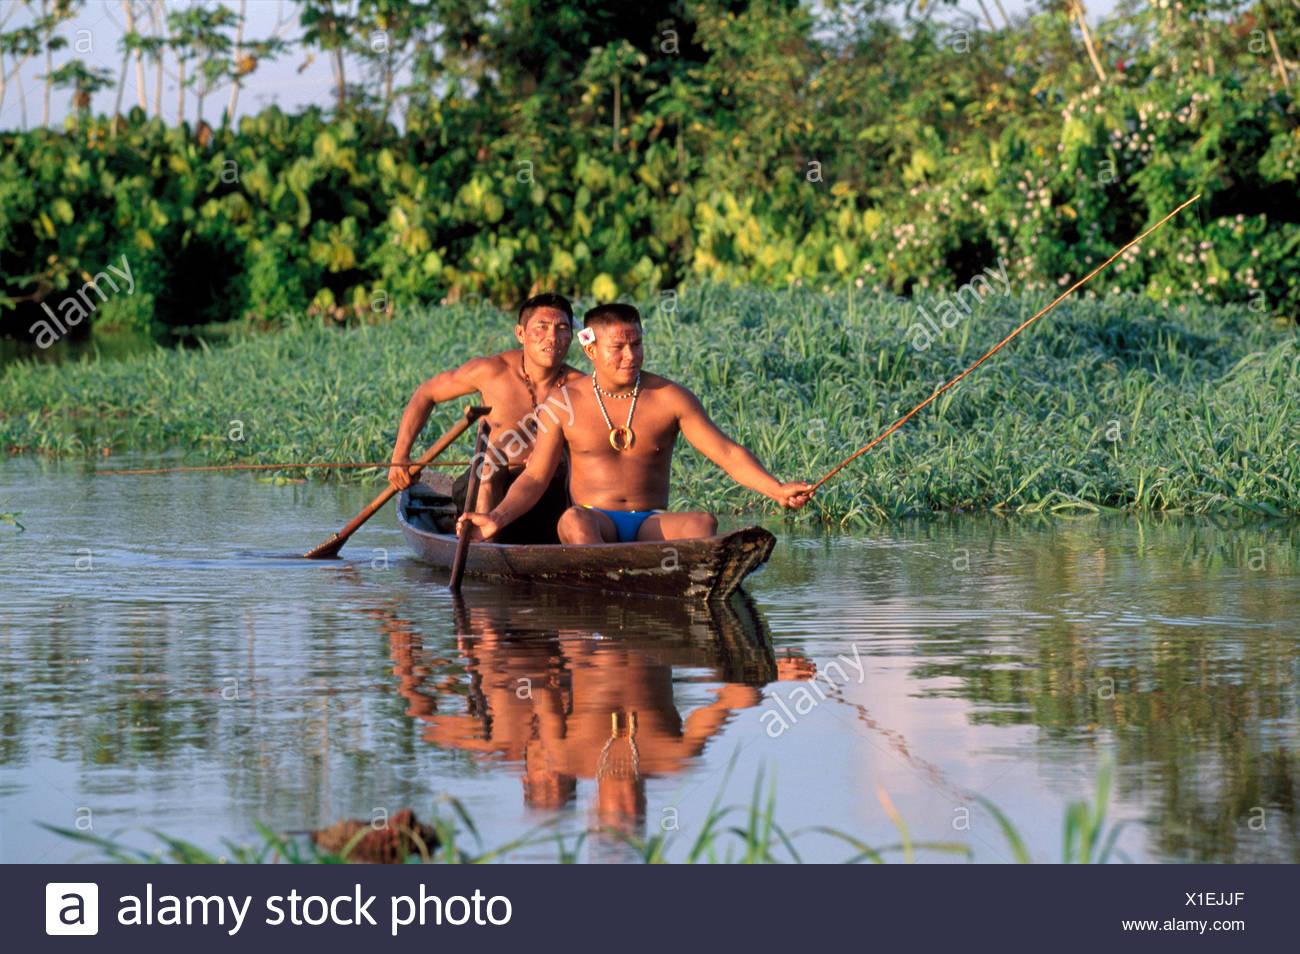 Brazil Amazon Indigenous People Stock Photos & Brazil ...